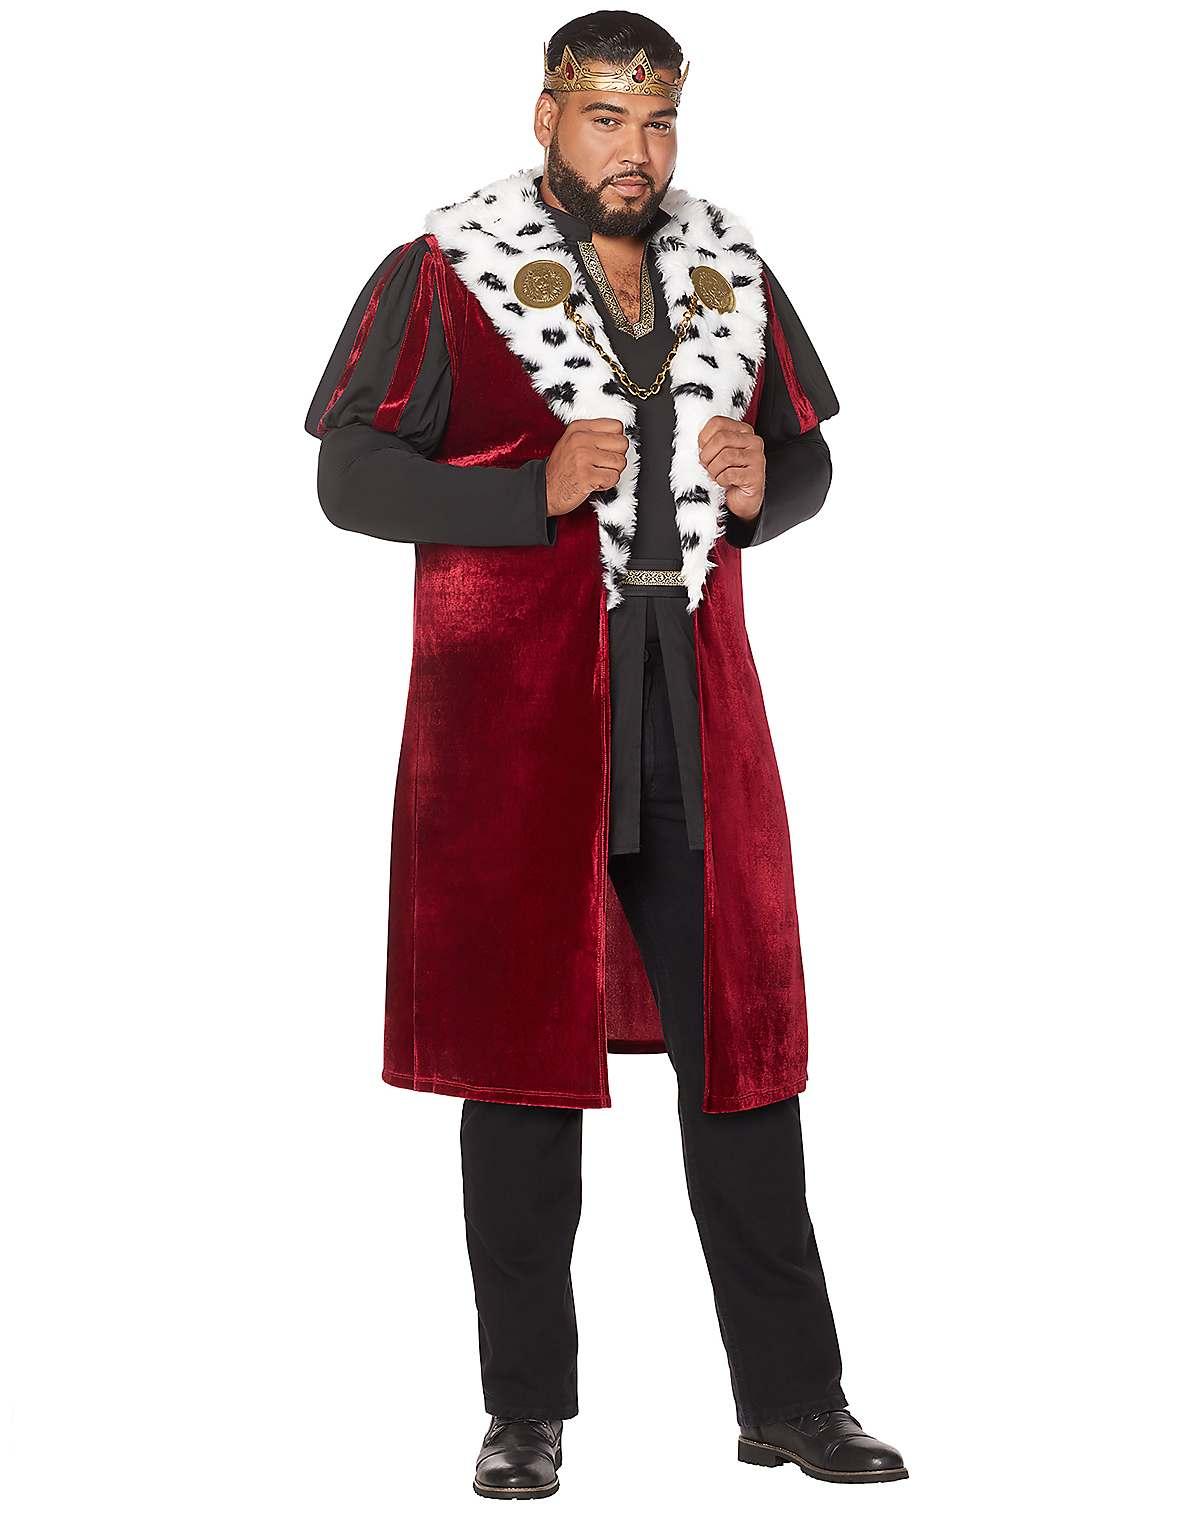 Noble King plus size costume